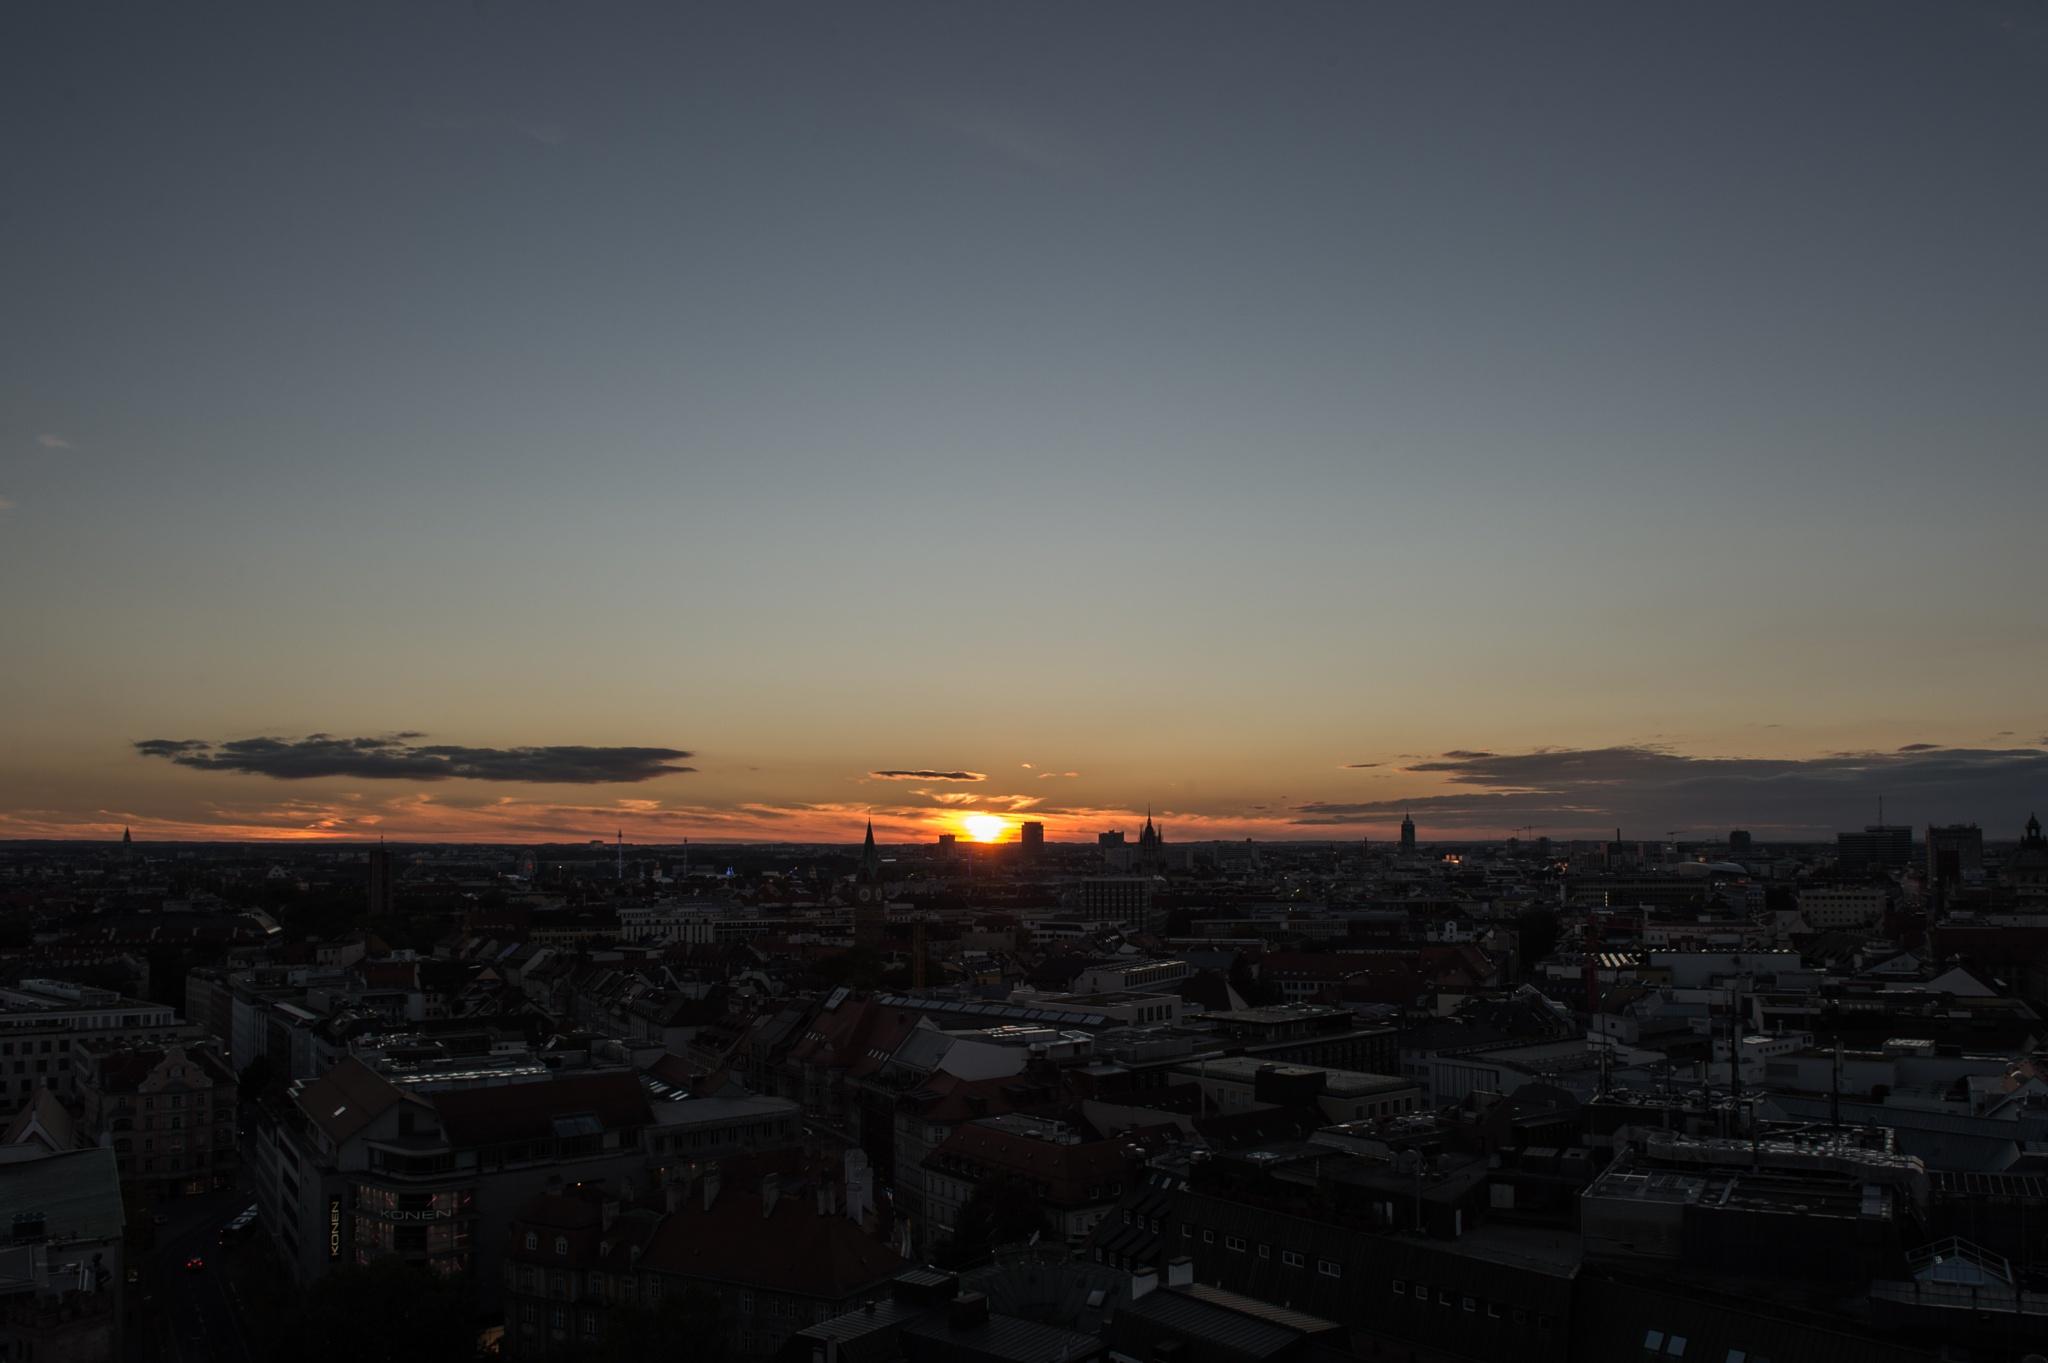 Sunset by Kai Kim